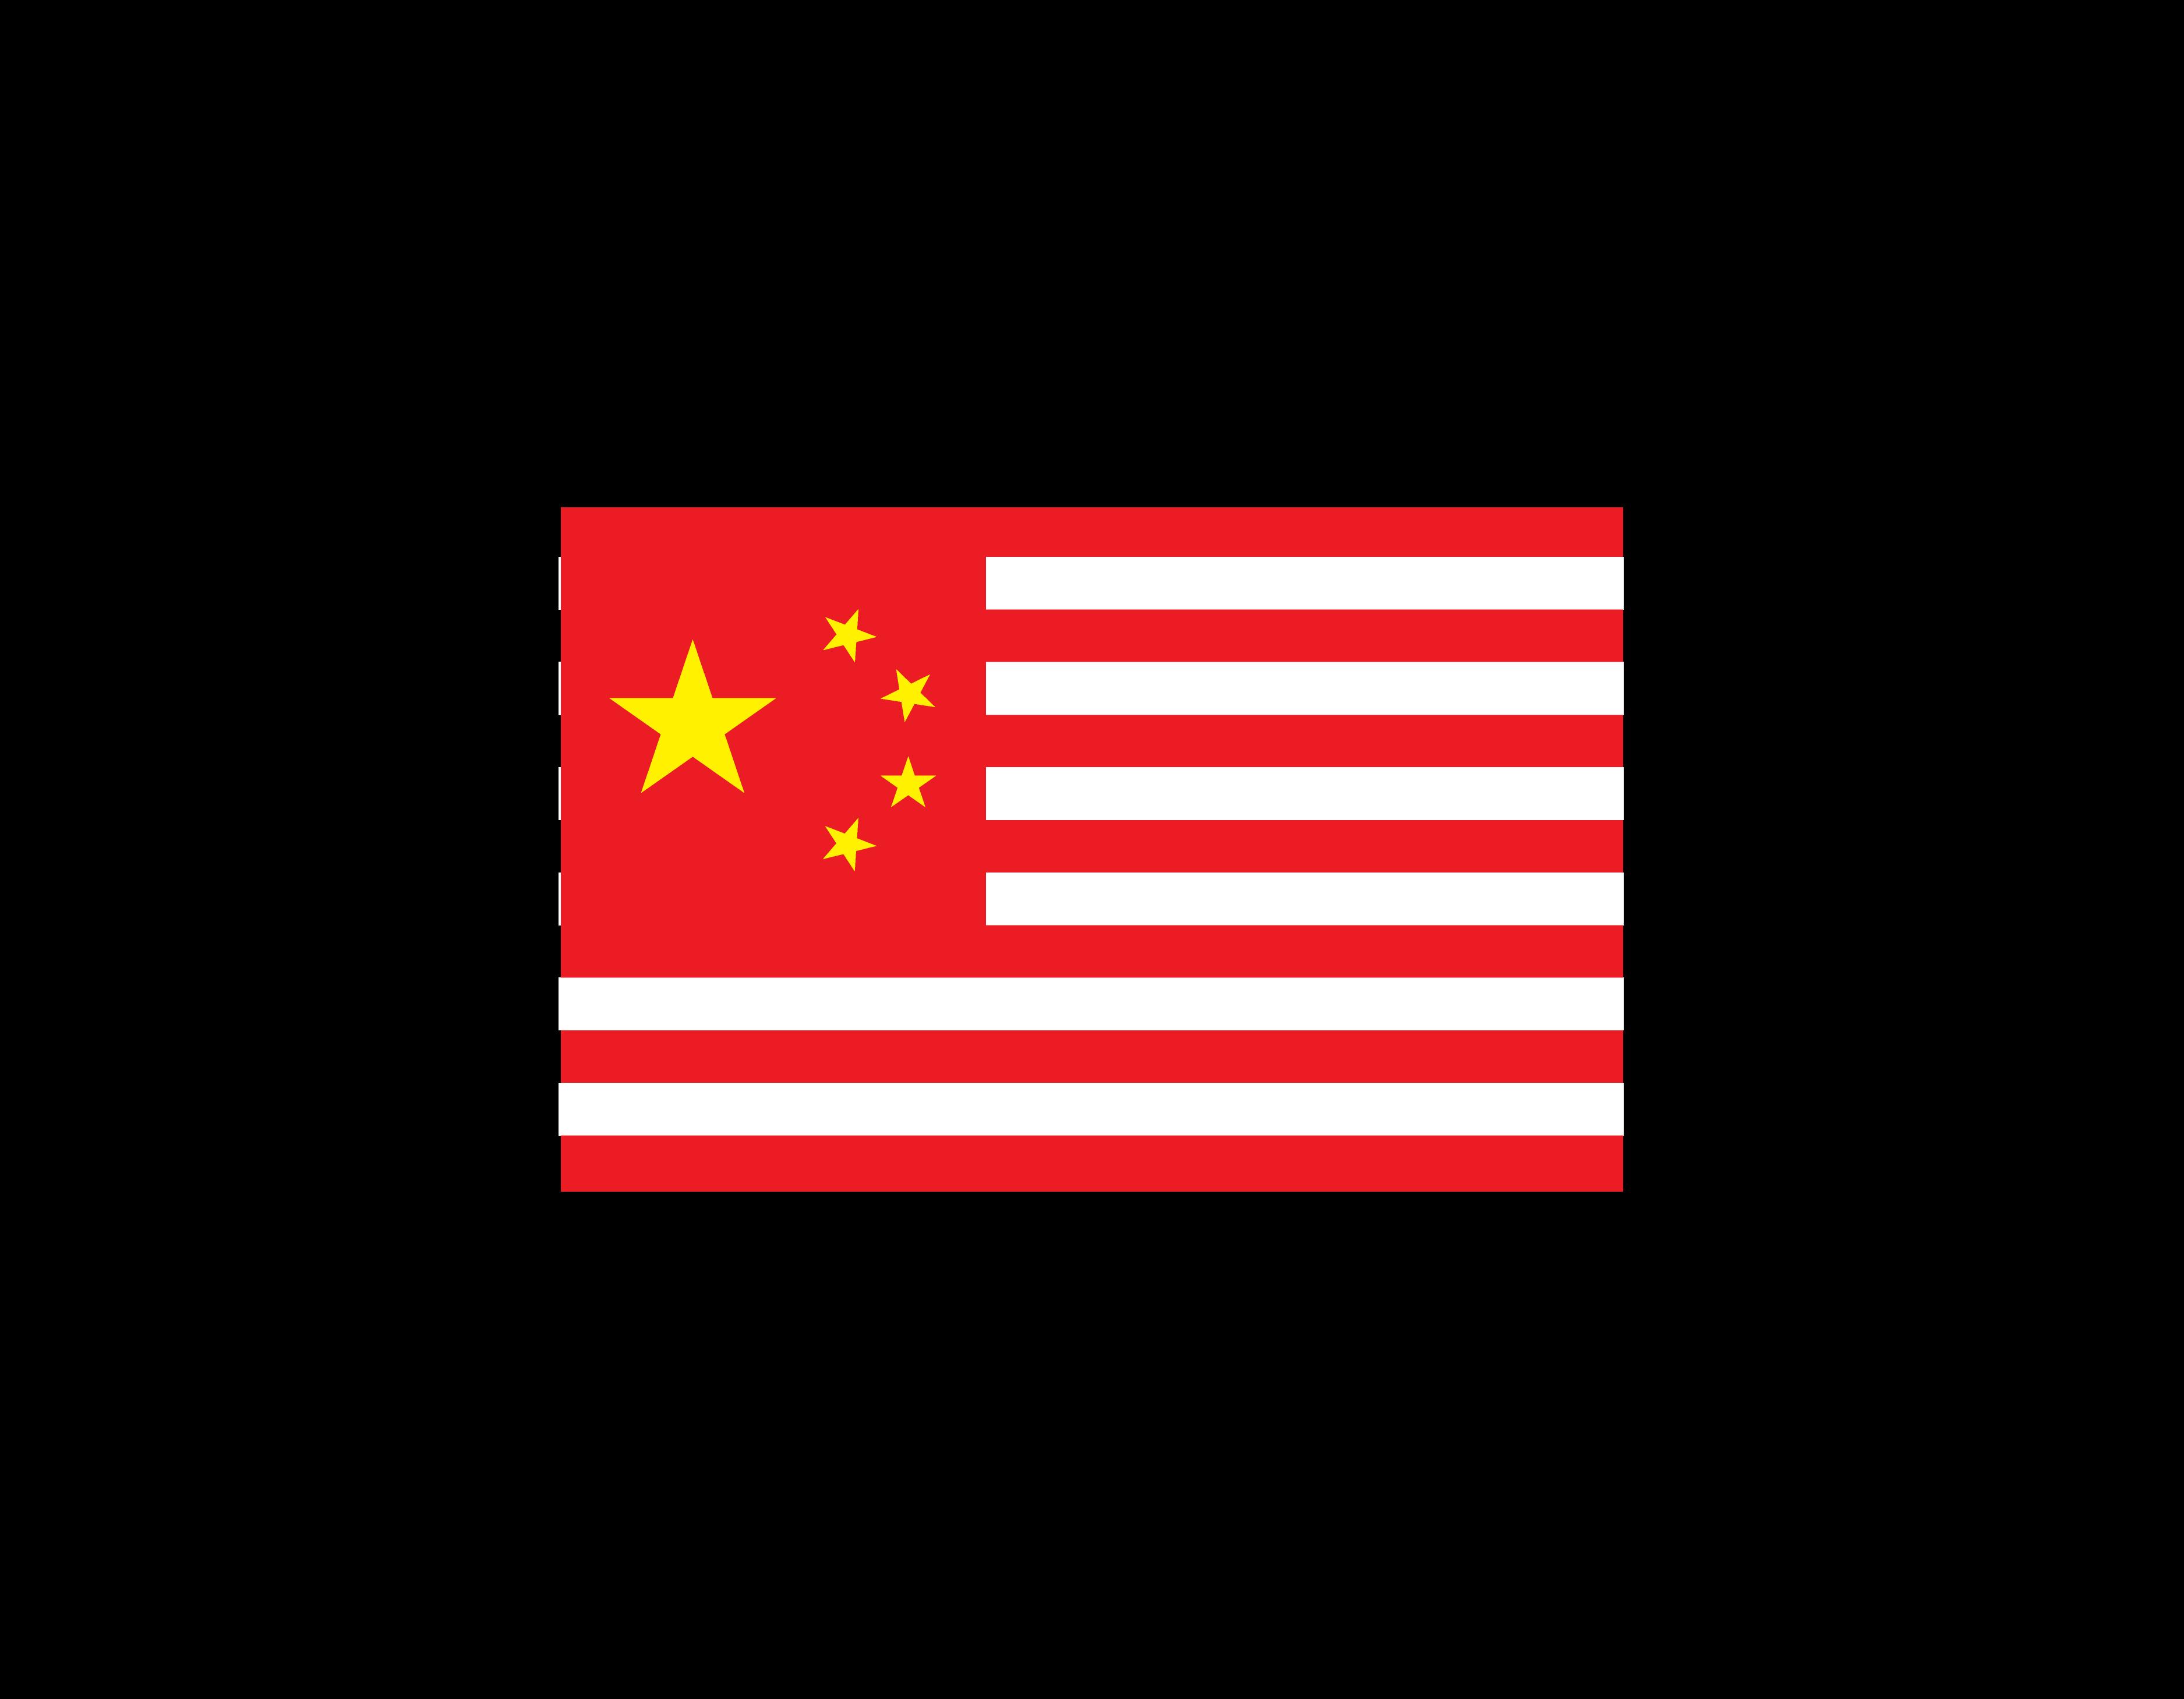 When China Calls In U S S Debt Flag Design Gaming Logos Tech Company Logos